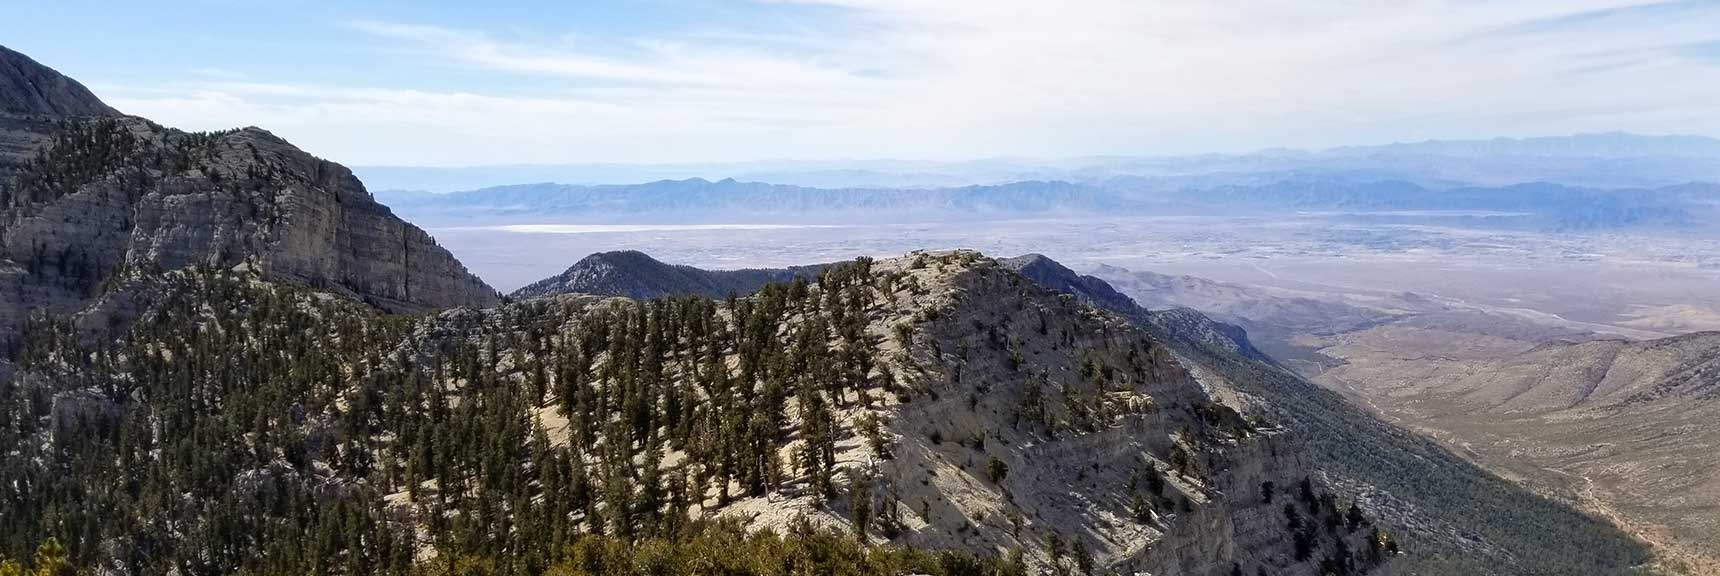 Pahrump and Telescope Peak Viewed from Lee Peak in Kyle Canyon, Spring Mountains, Nevada Slide 001